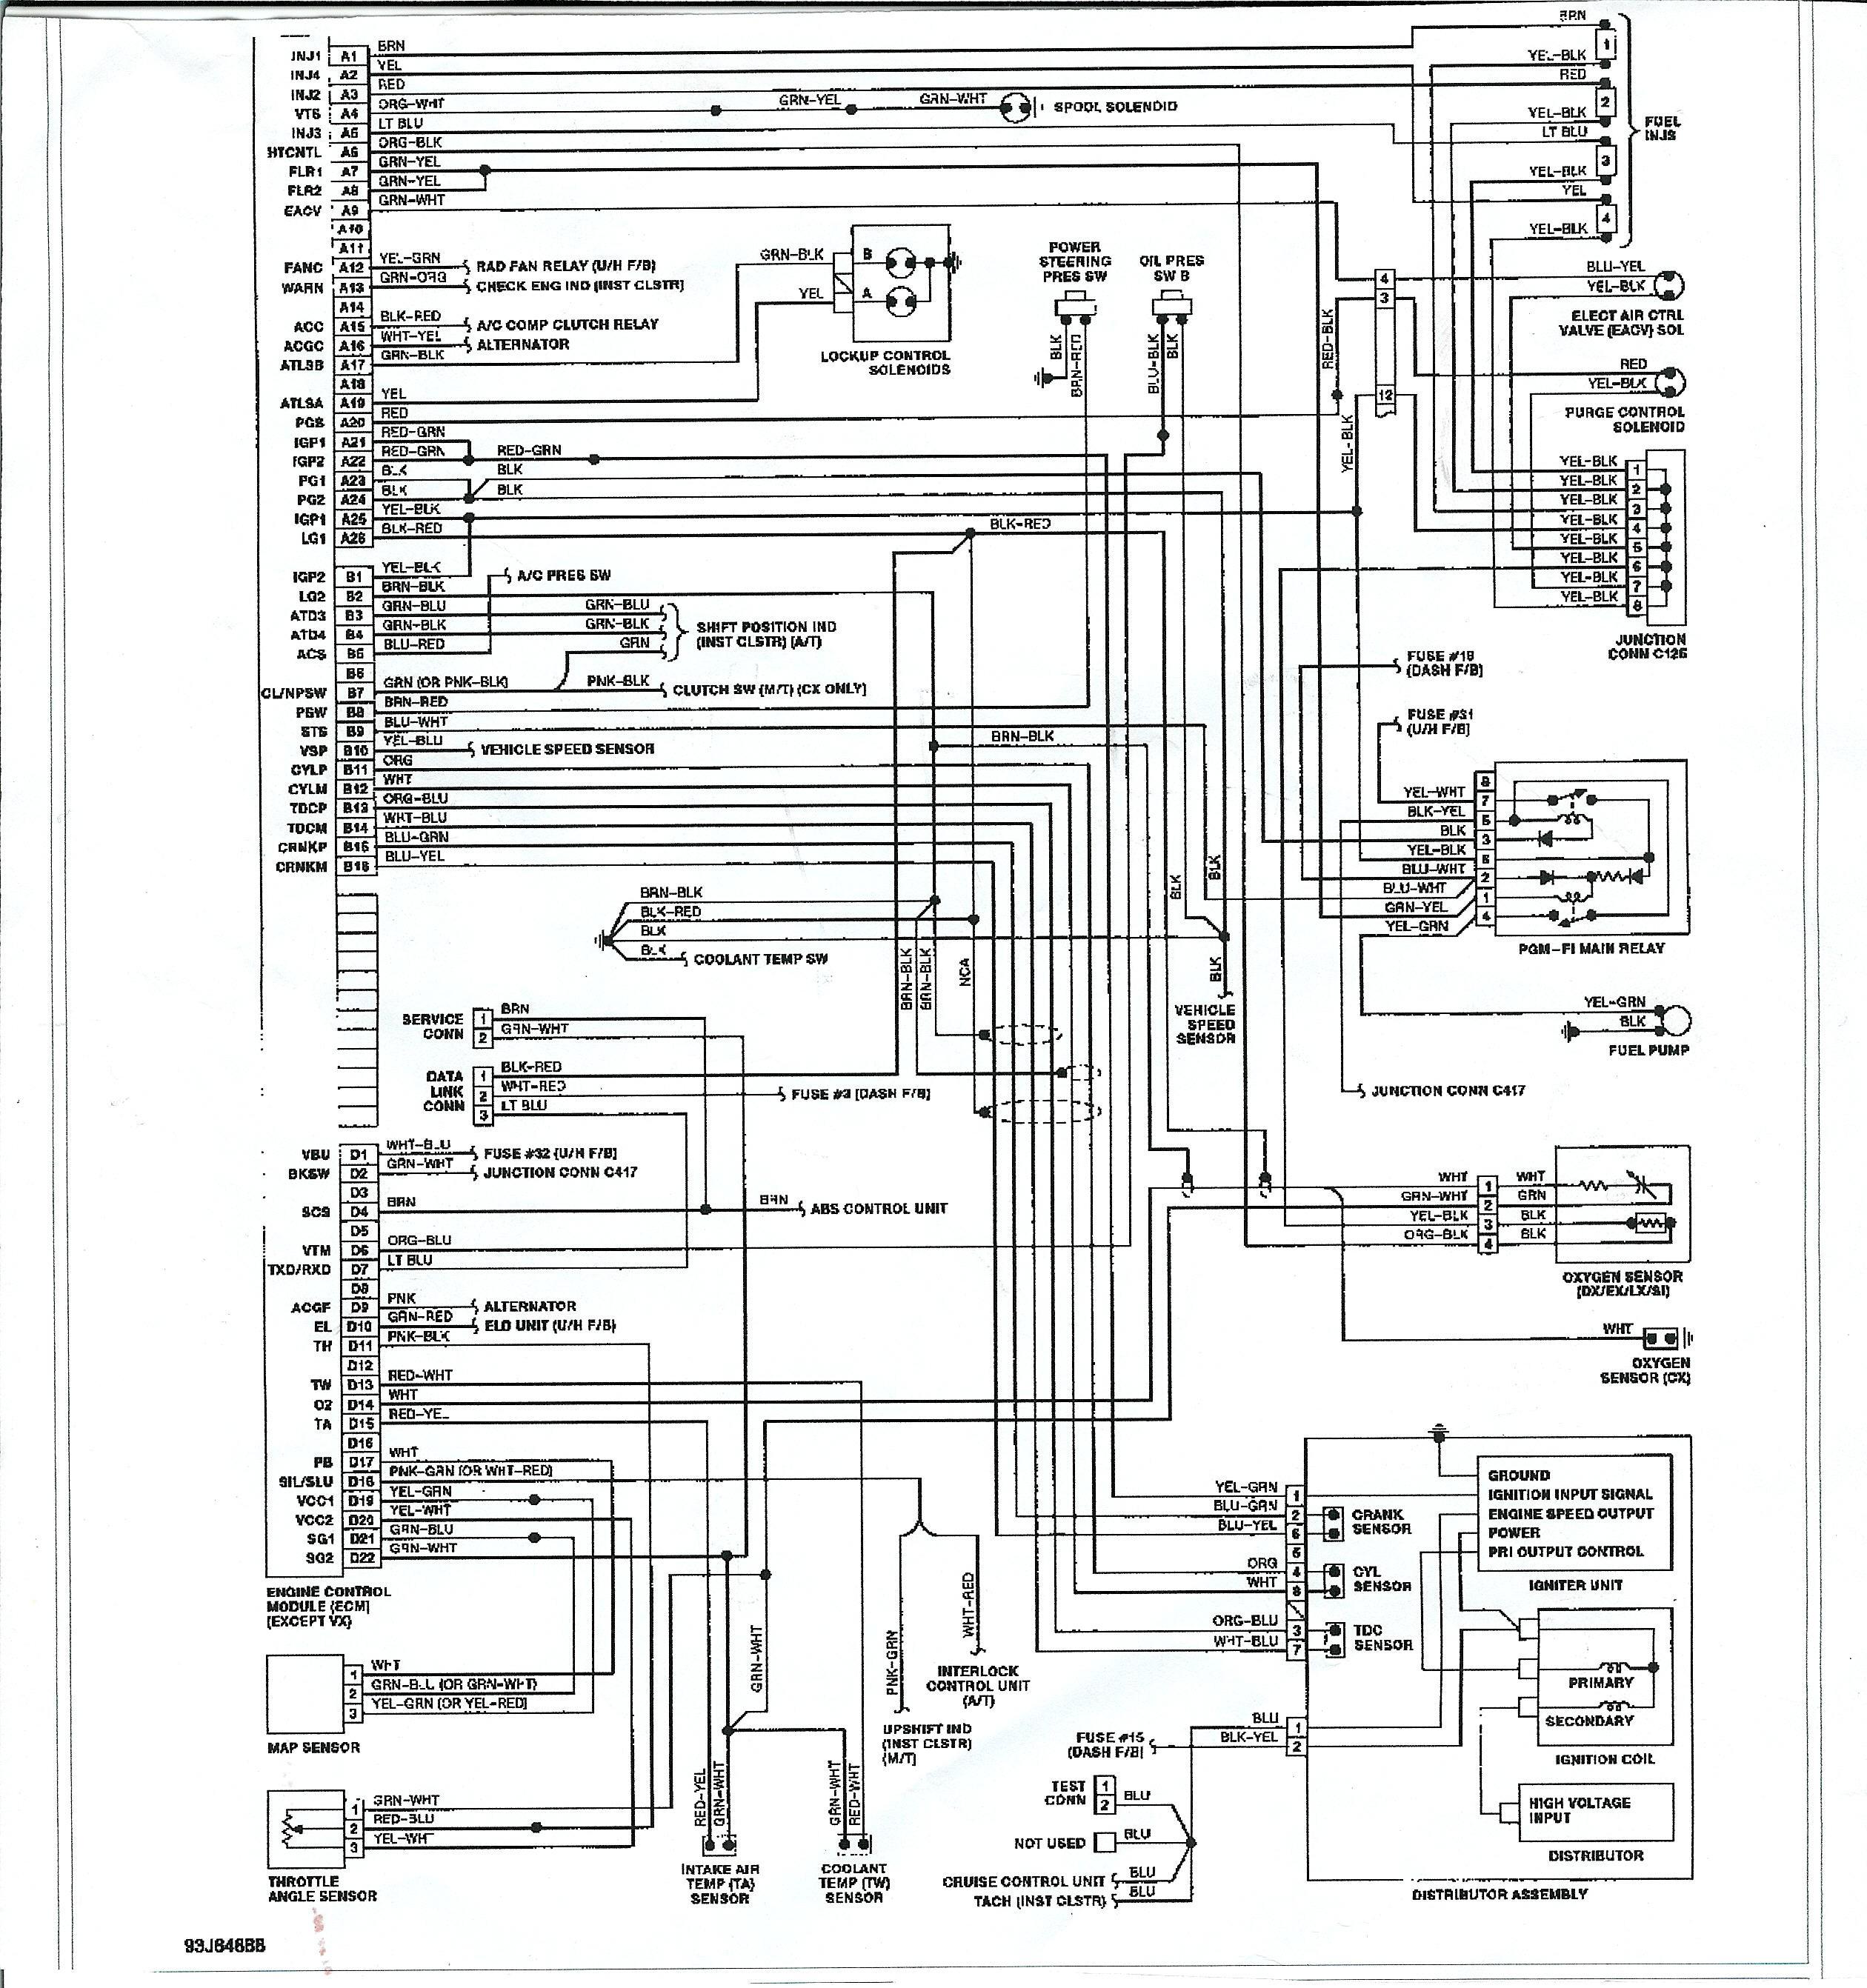 95 honda civic engine diagram my wiring diagram 94 honda civic engine diagram honda civic engine diagram unusual 1995 toyota 4runner wiring diagram gallery electrical rh eidetec